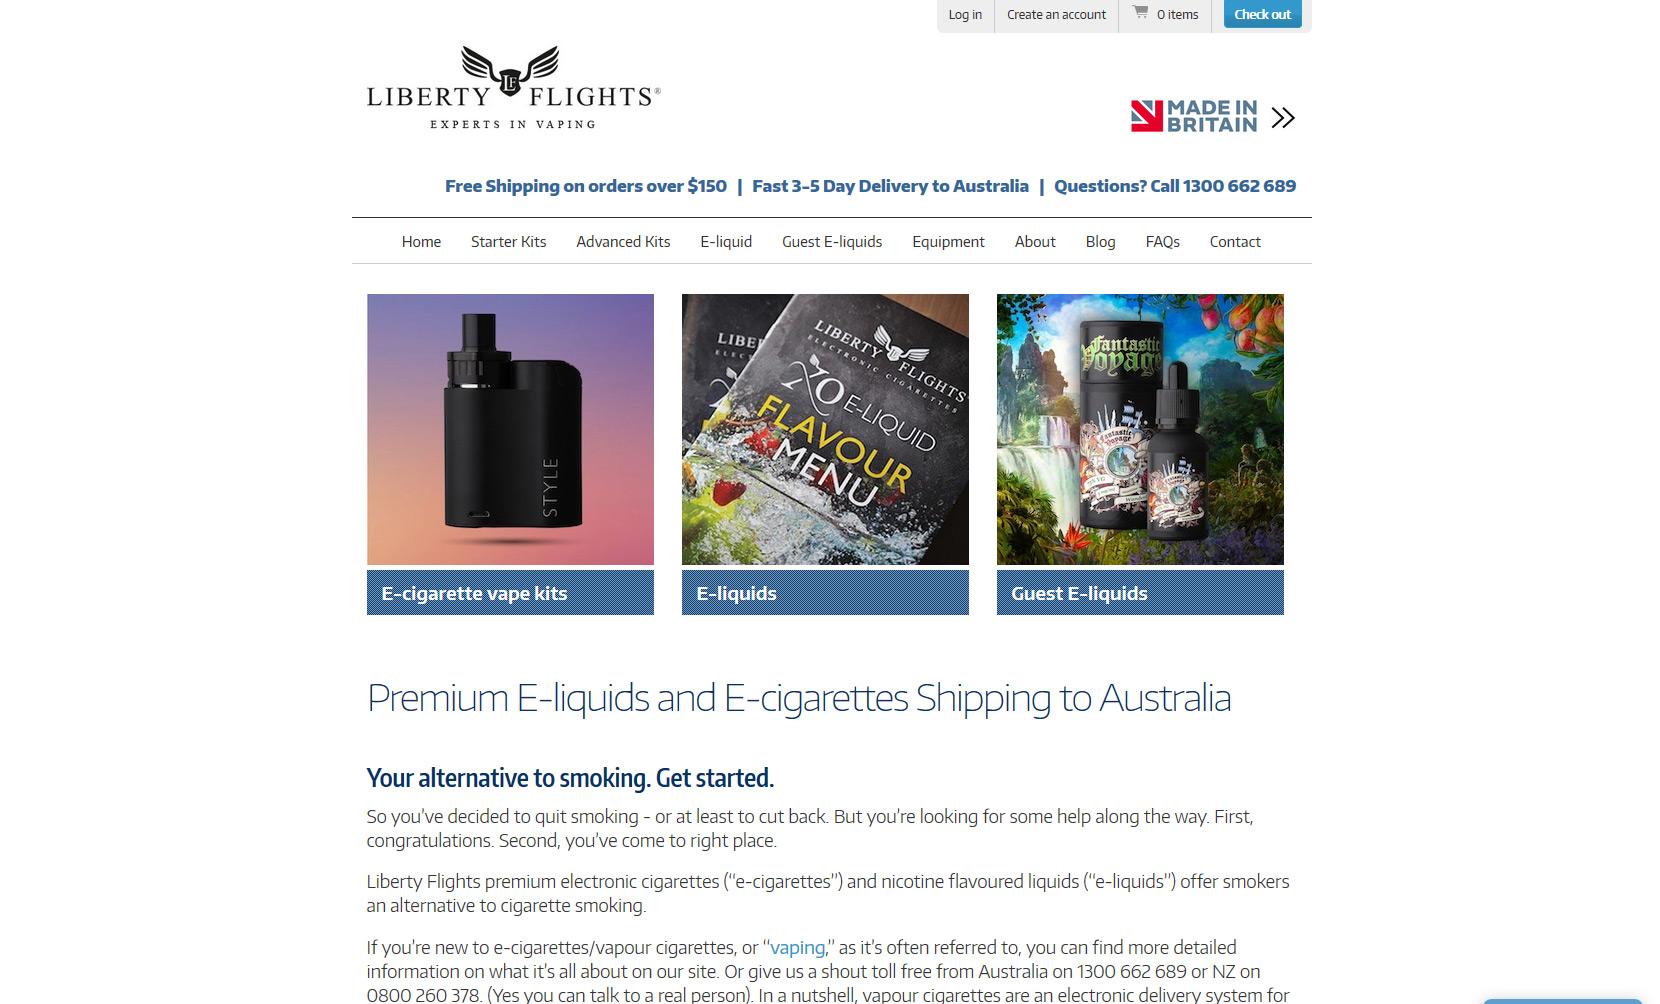 VaporFi Australia - Best Places to Buy E-Liquid: Liberty Flights